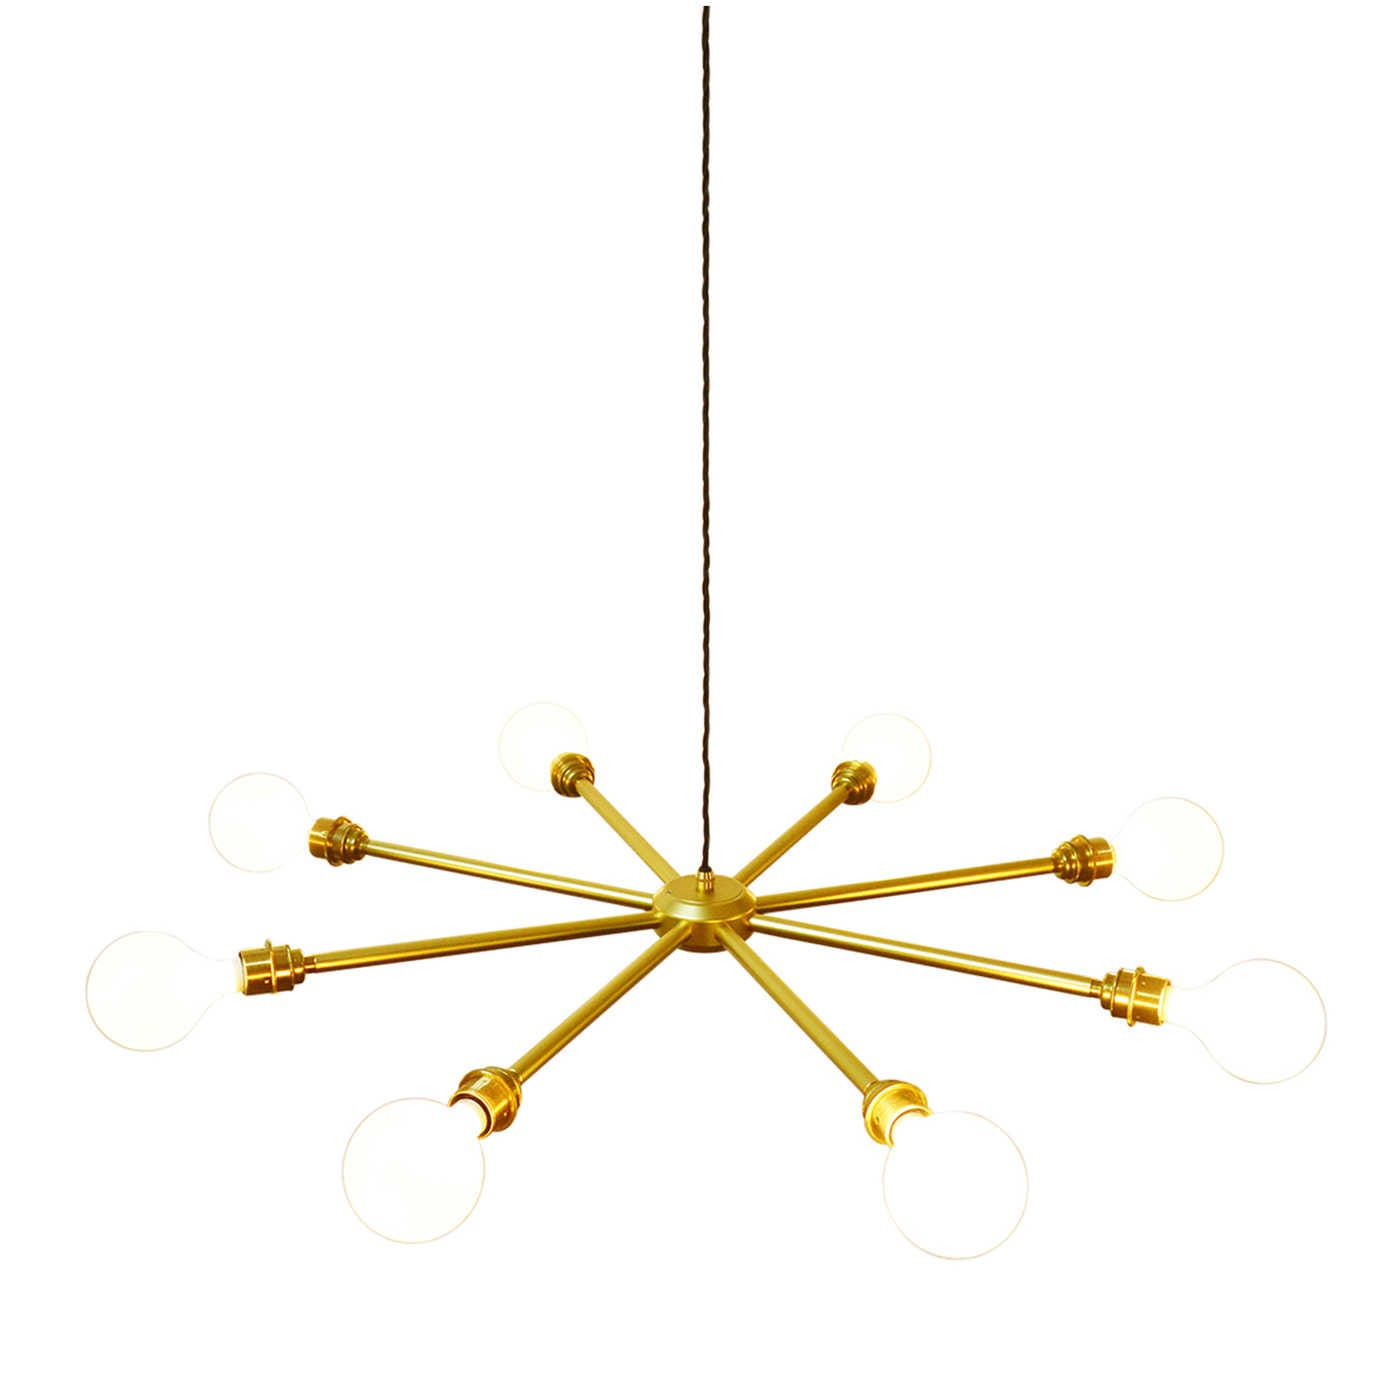 Vega 8- 8 Globe Filament Chandelier